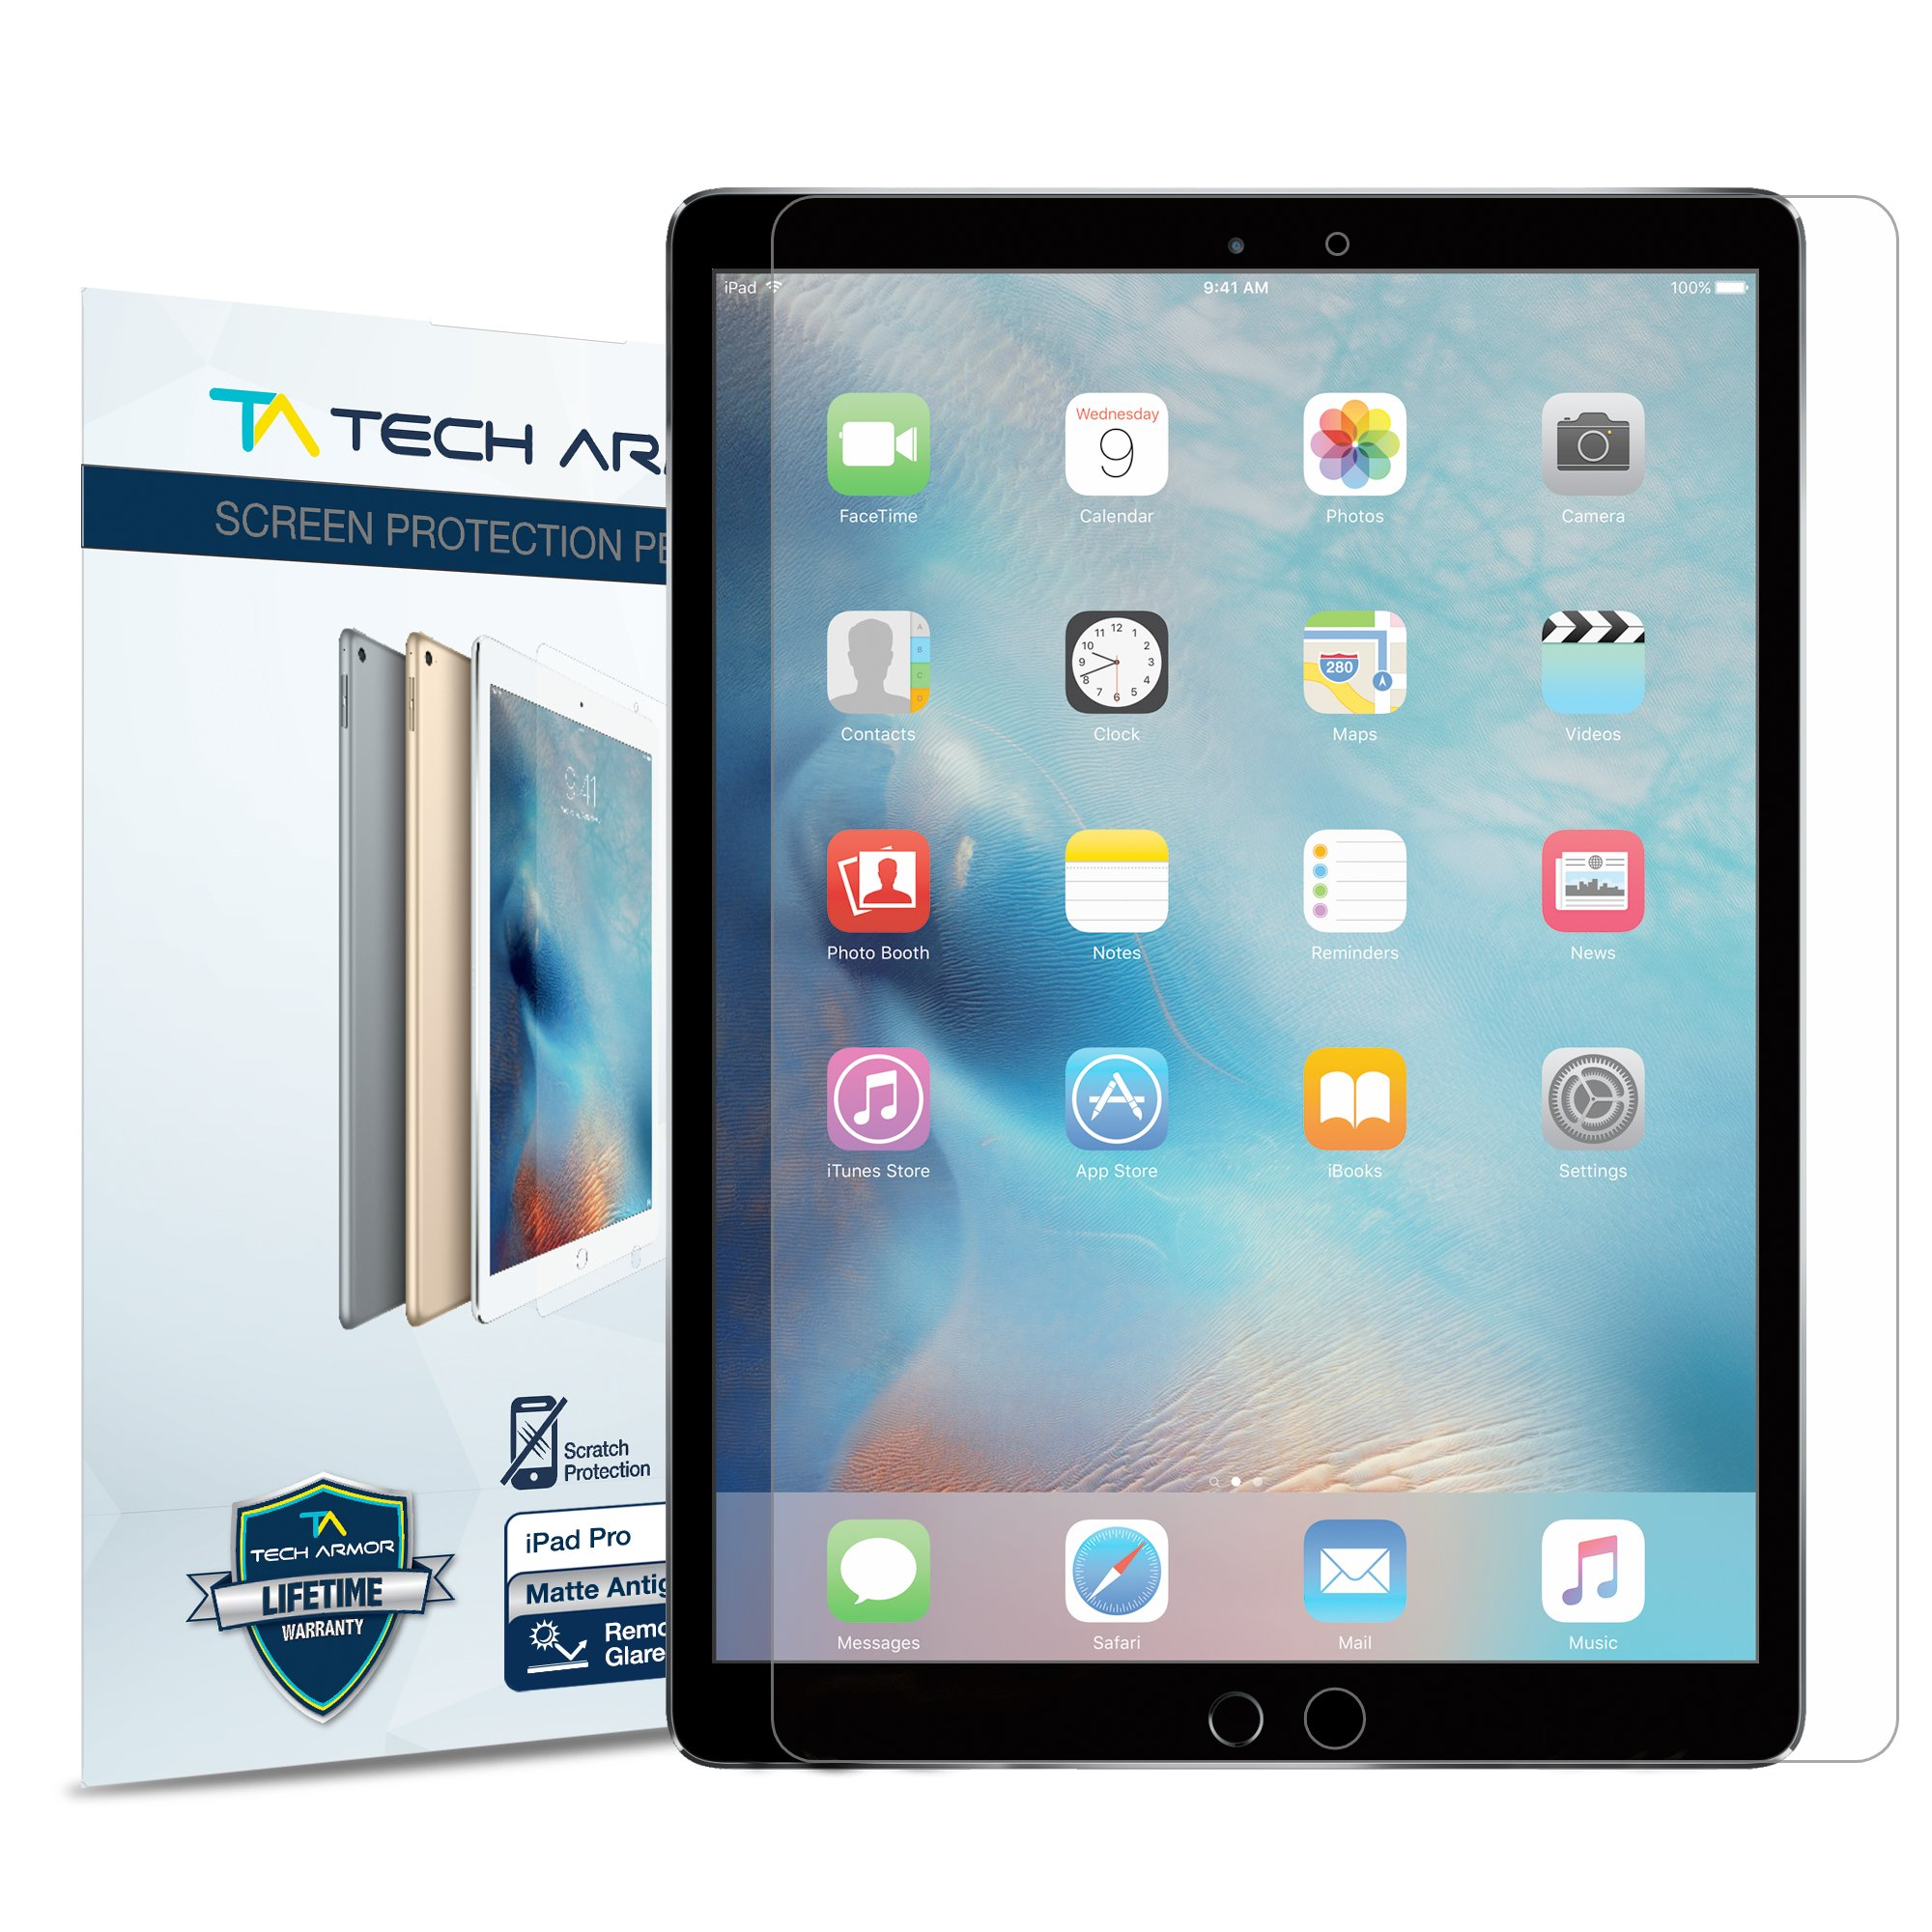 Tech Armor iPad Pro (12.9'') Anti-Glare Ballistic Glass Screen Protector for Apple iPad Pro 12.9-inch (NEW 2017) [1-pack]